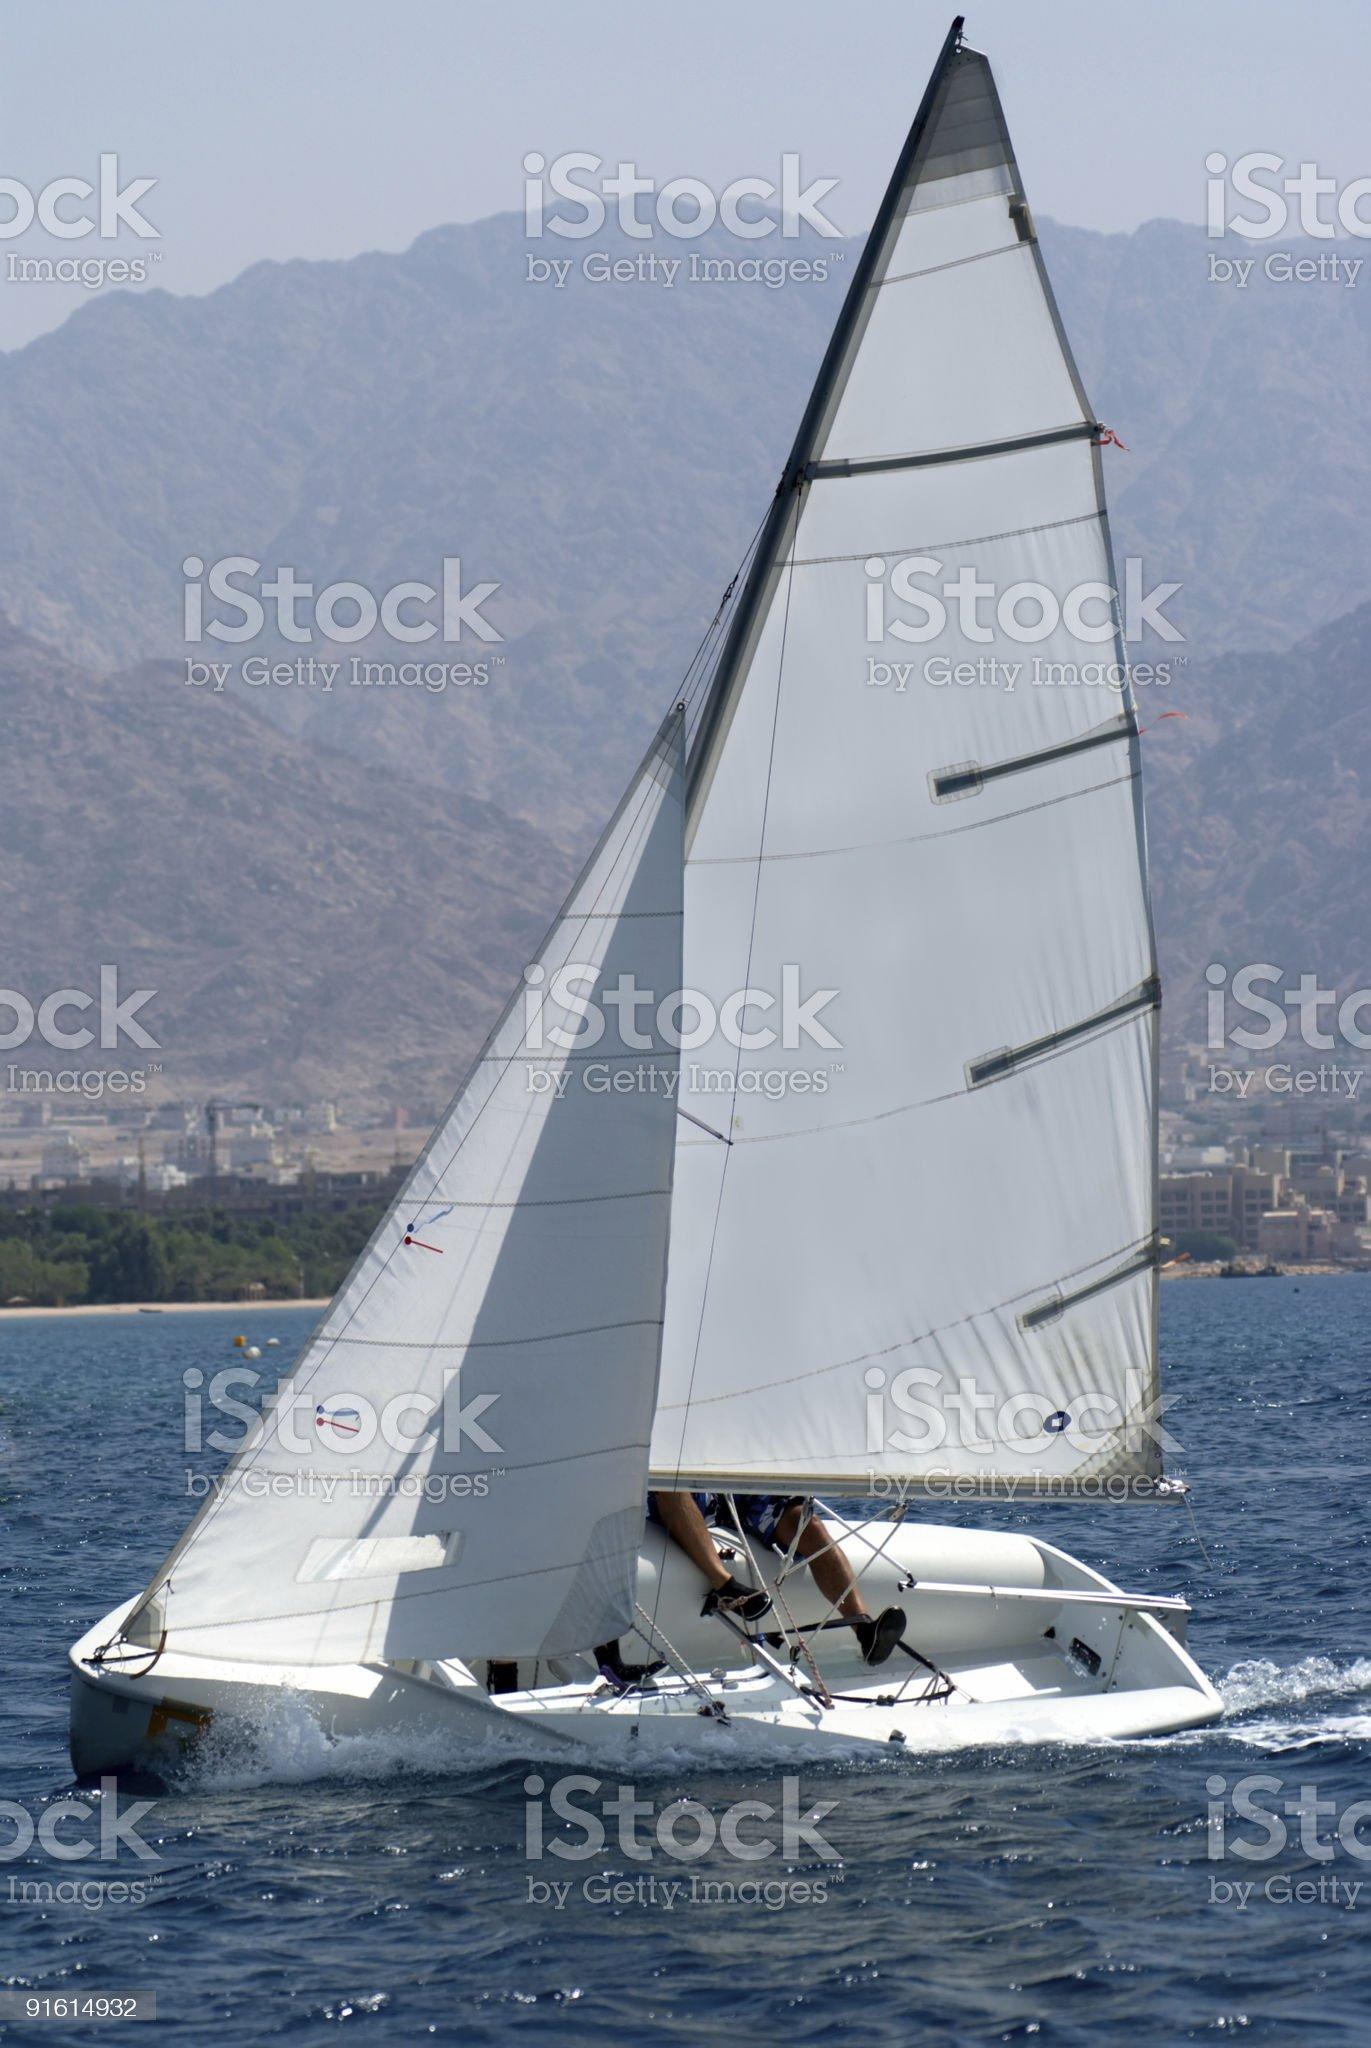 Team sailing on a small sail boat  royalty-free stock photo